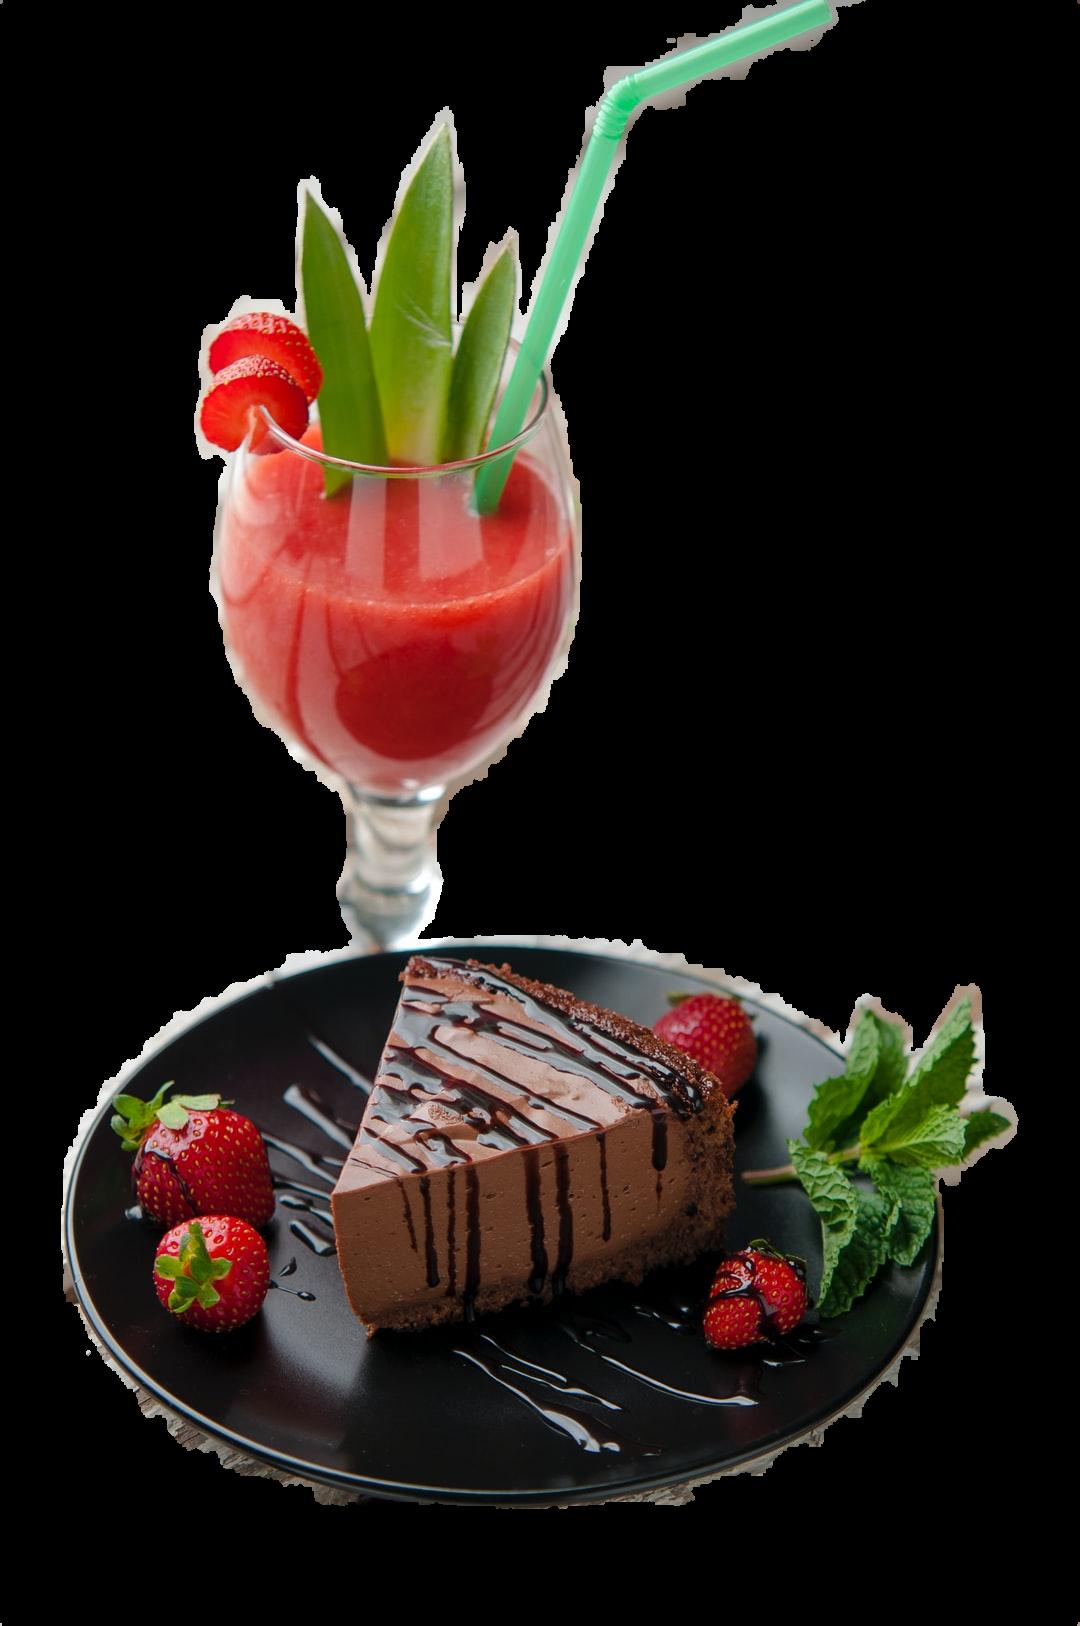 chocolate cake beside strawberries and wine glass